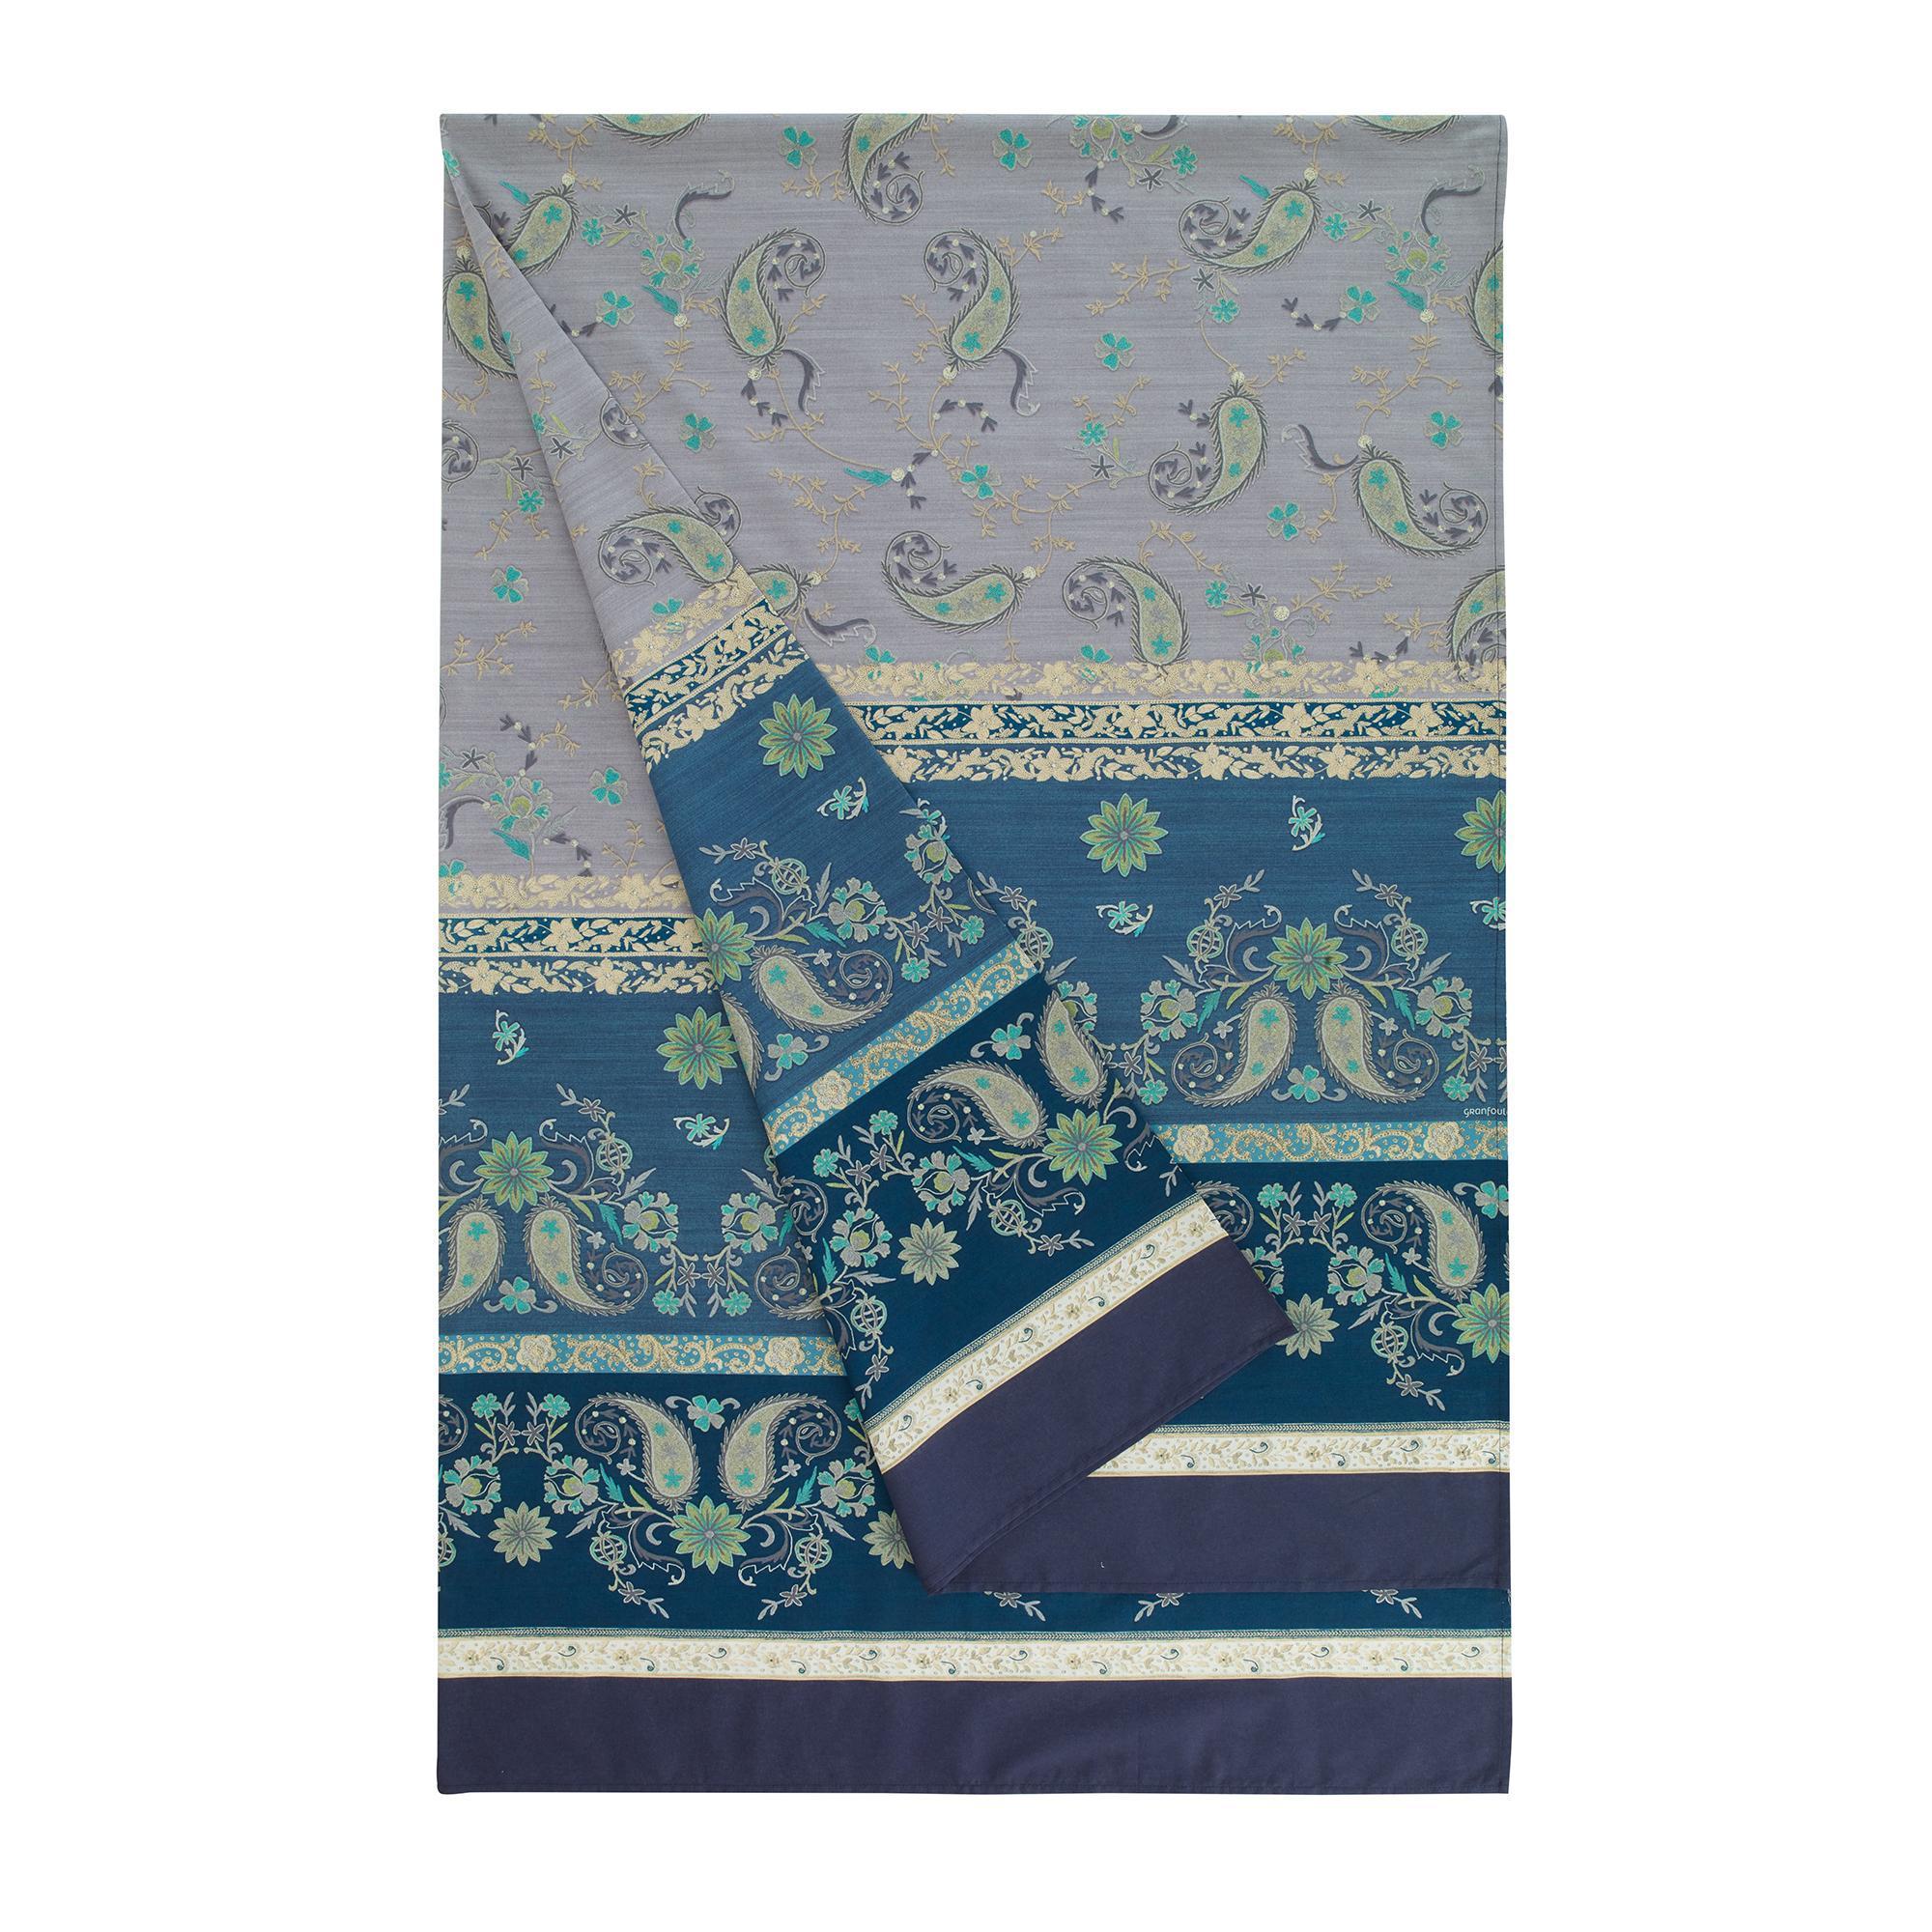 Bassetti granfoulard sofa cover raffaello 180x270 v7 for Bassetti telo arredo